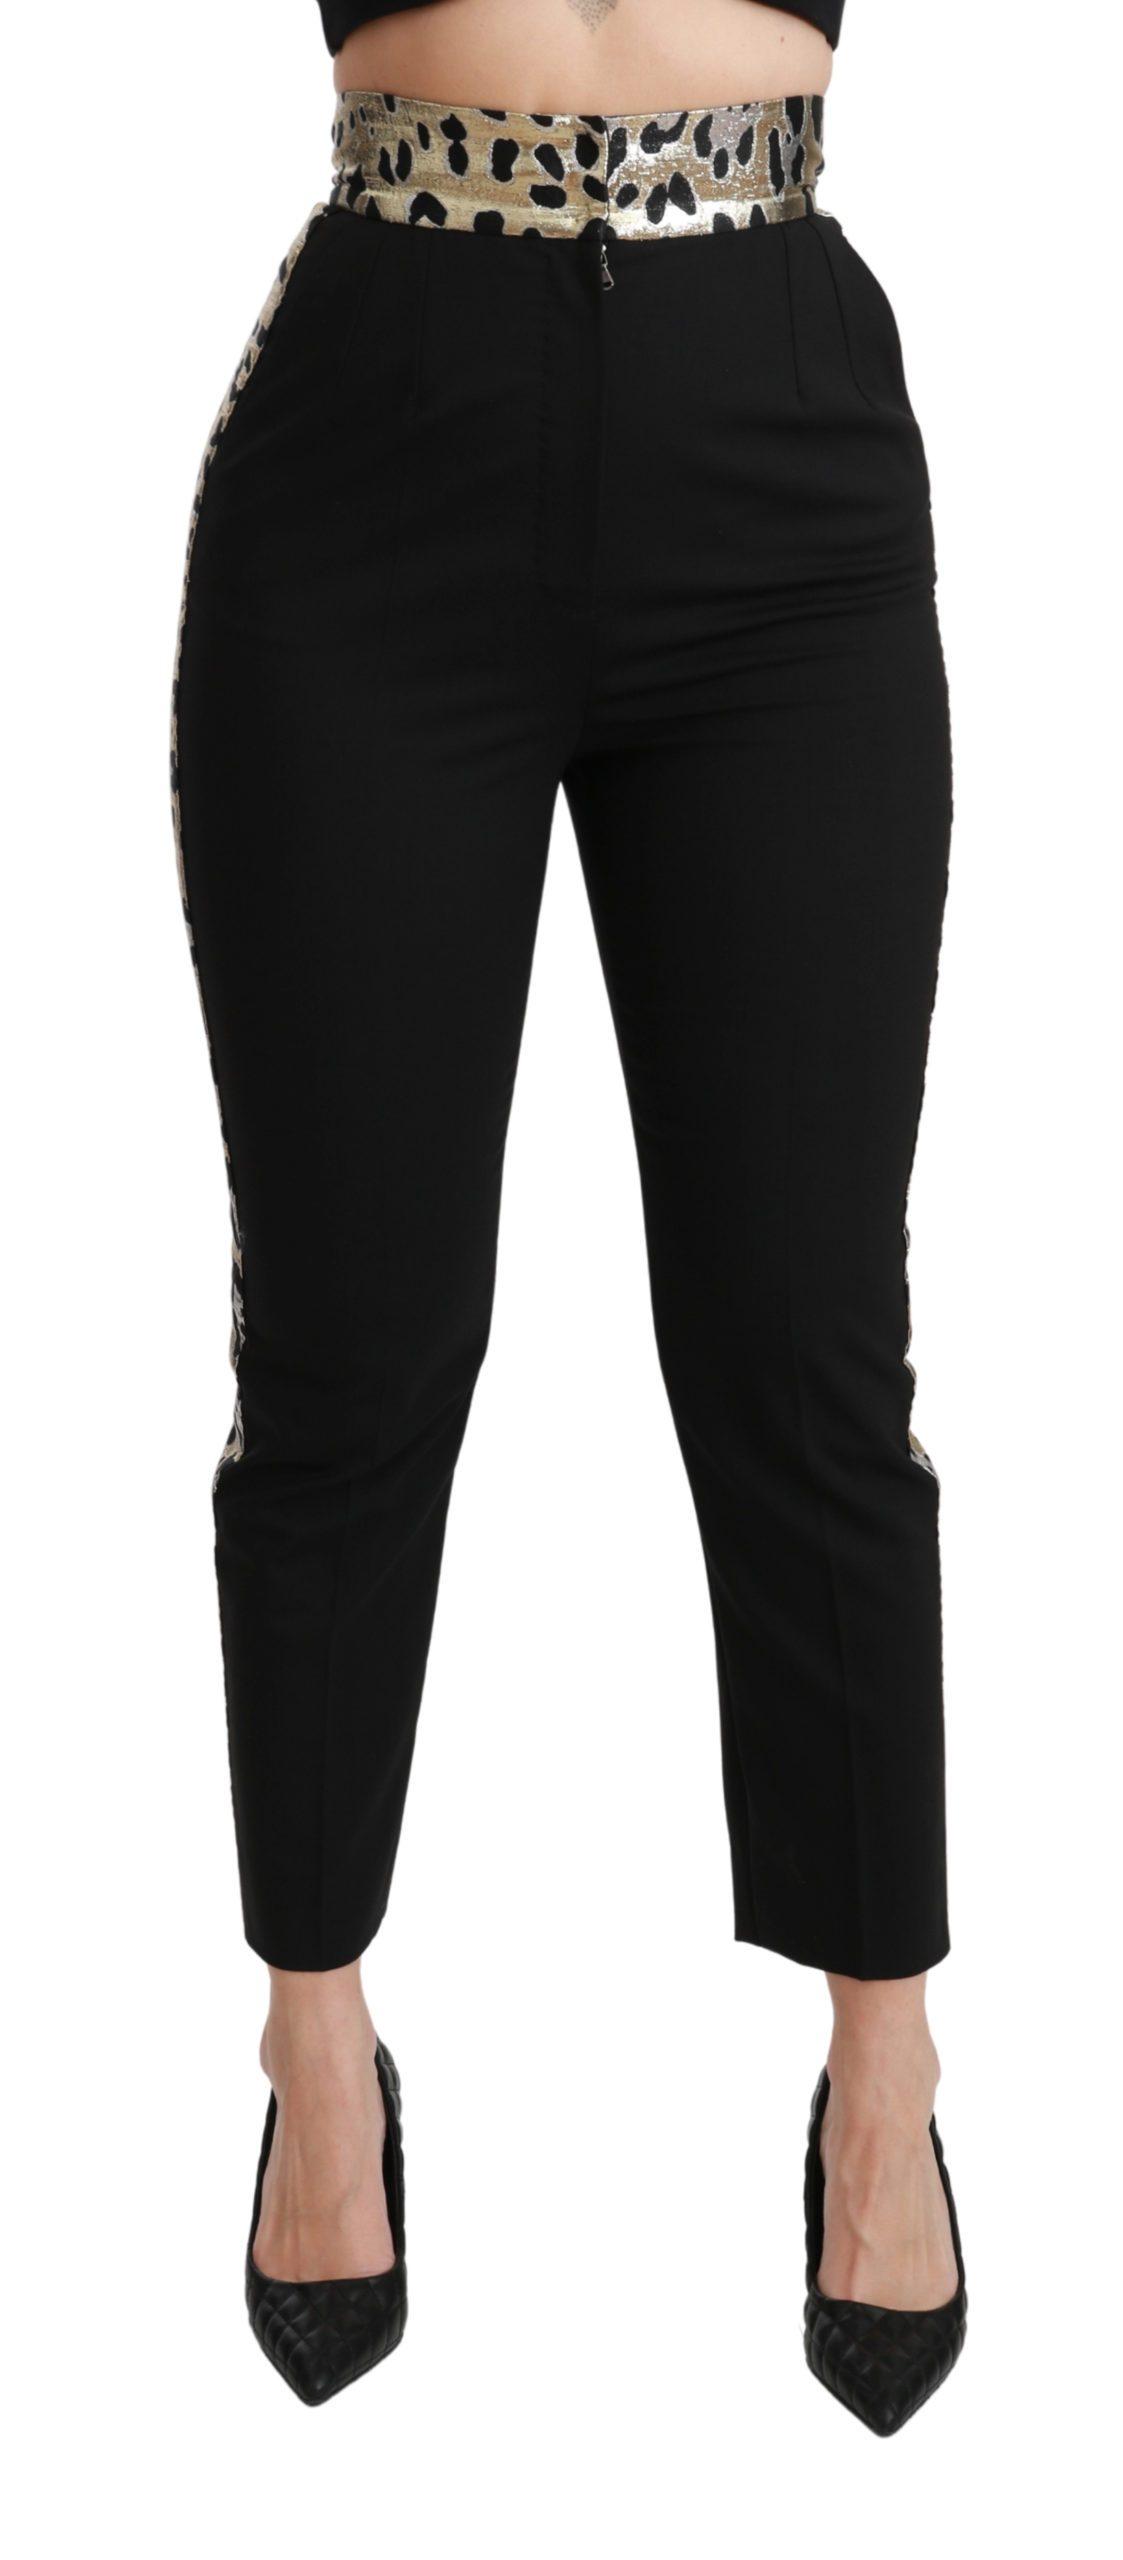 Dolce & Gabbana Women's Cropped Skinny High Waist Trouser Black PAN70940 - IT40|S